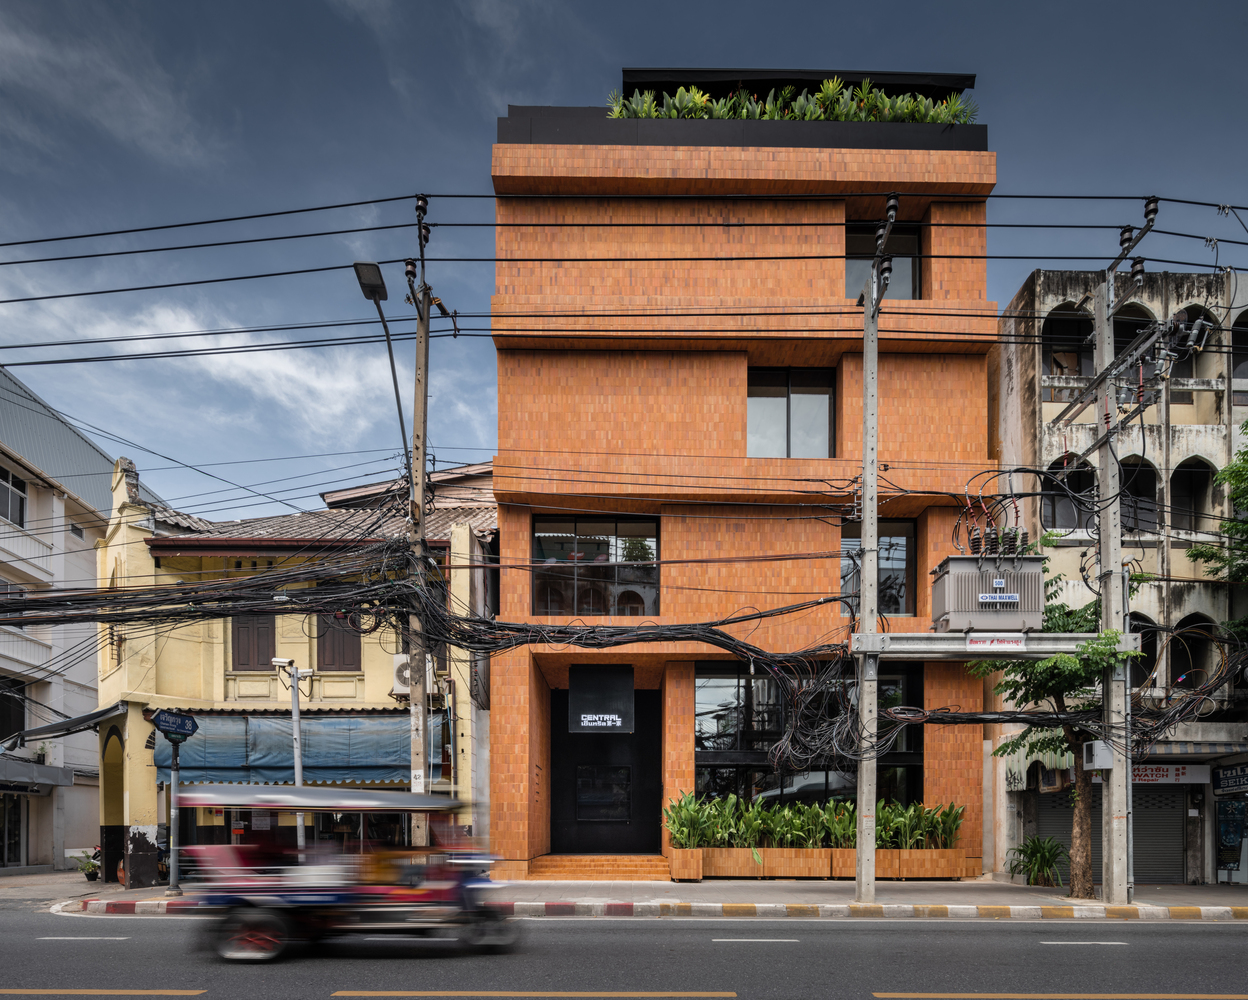 Central : The Original Store / Vincent Van Duysen Architects